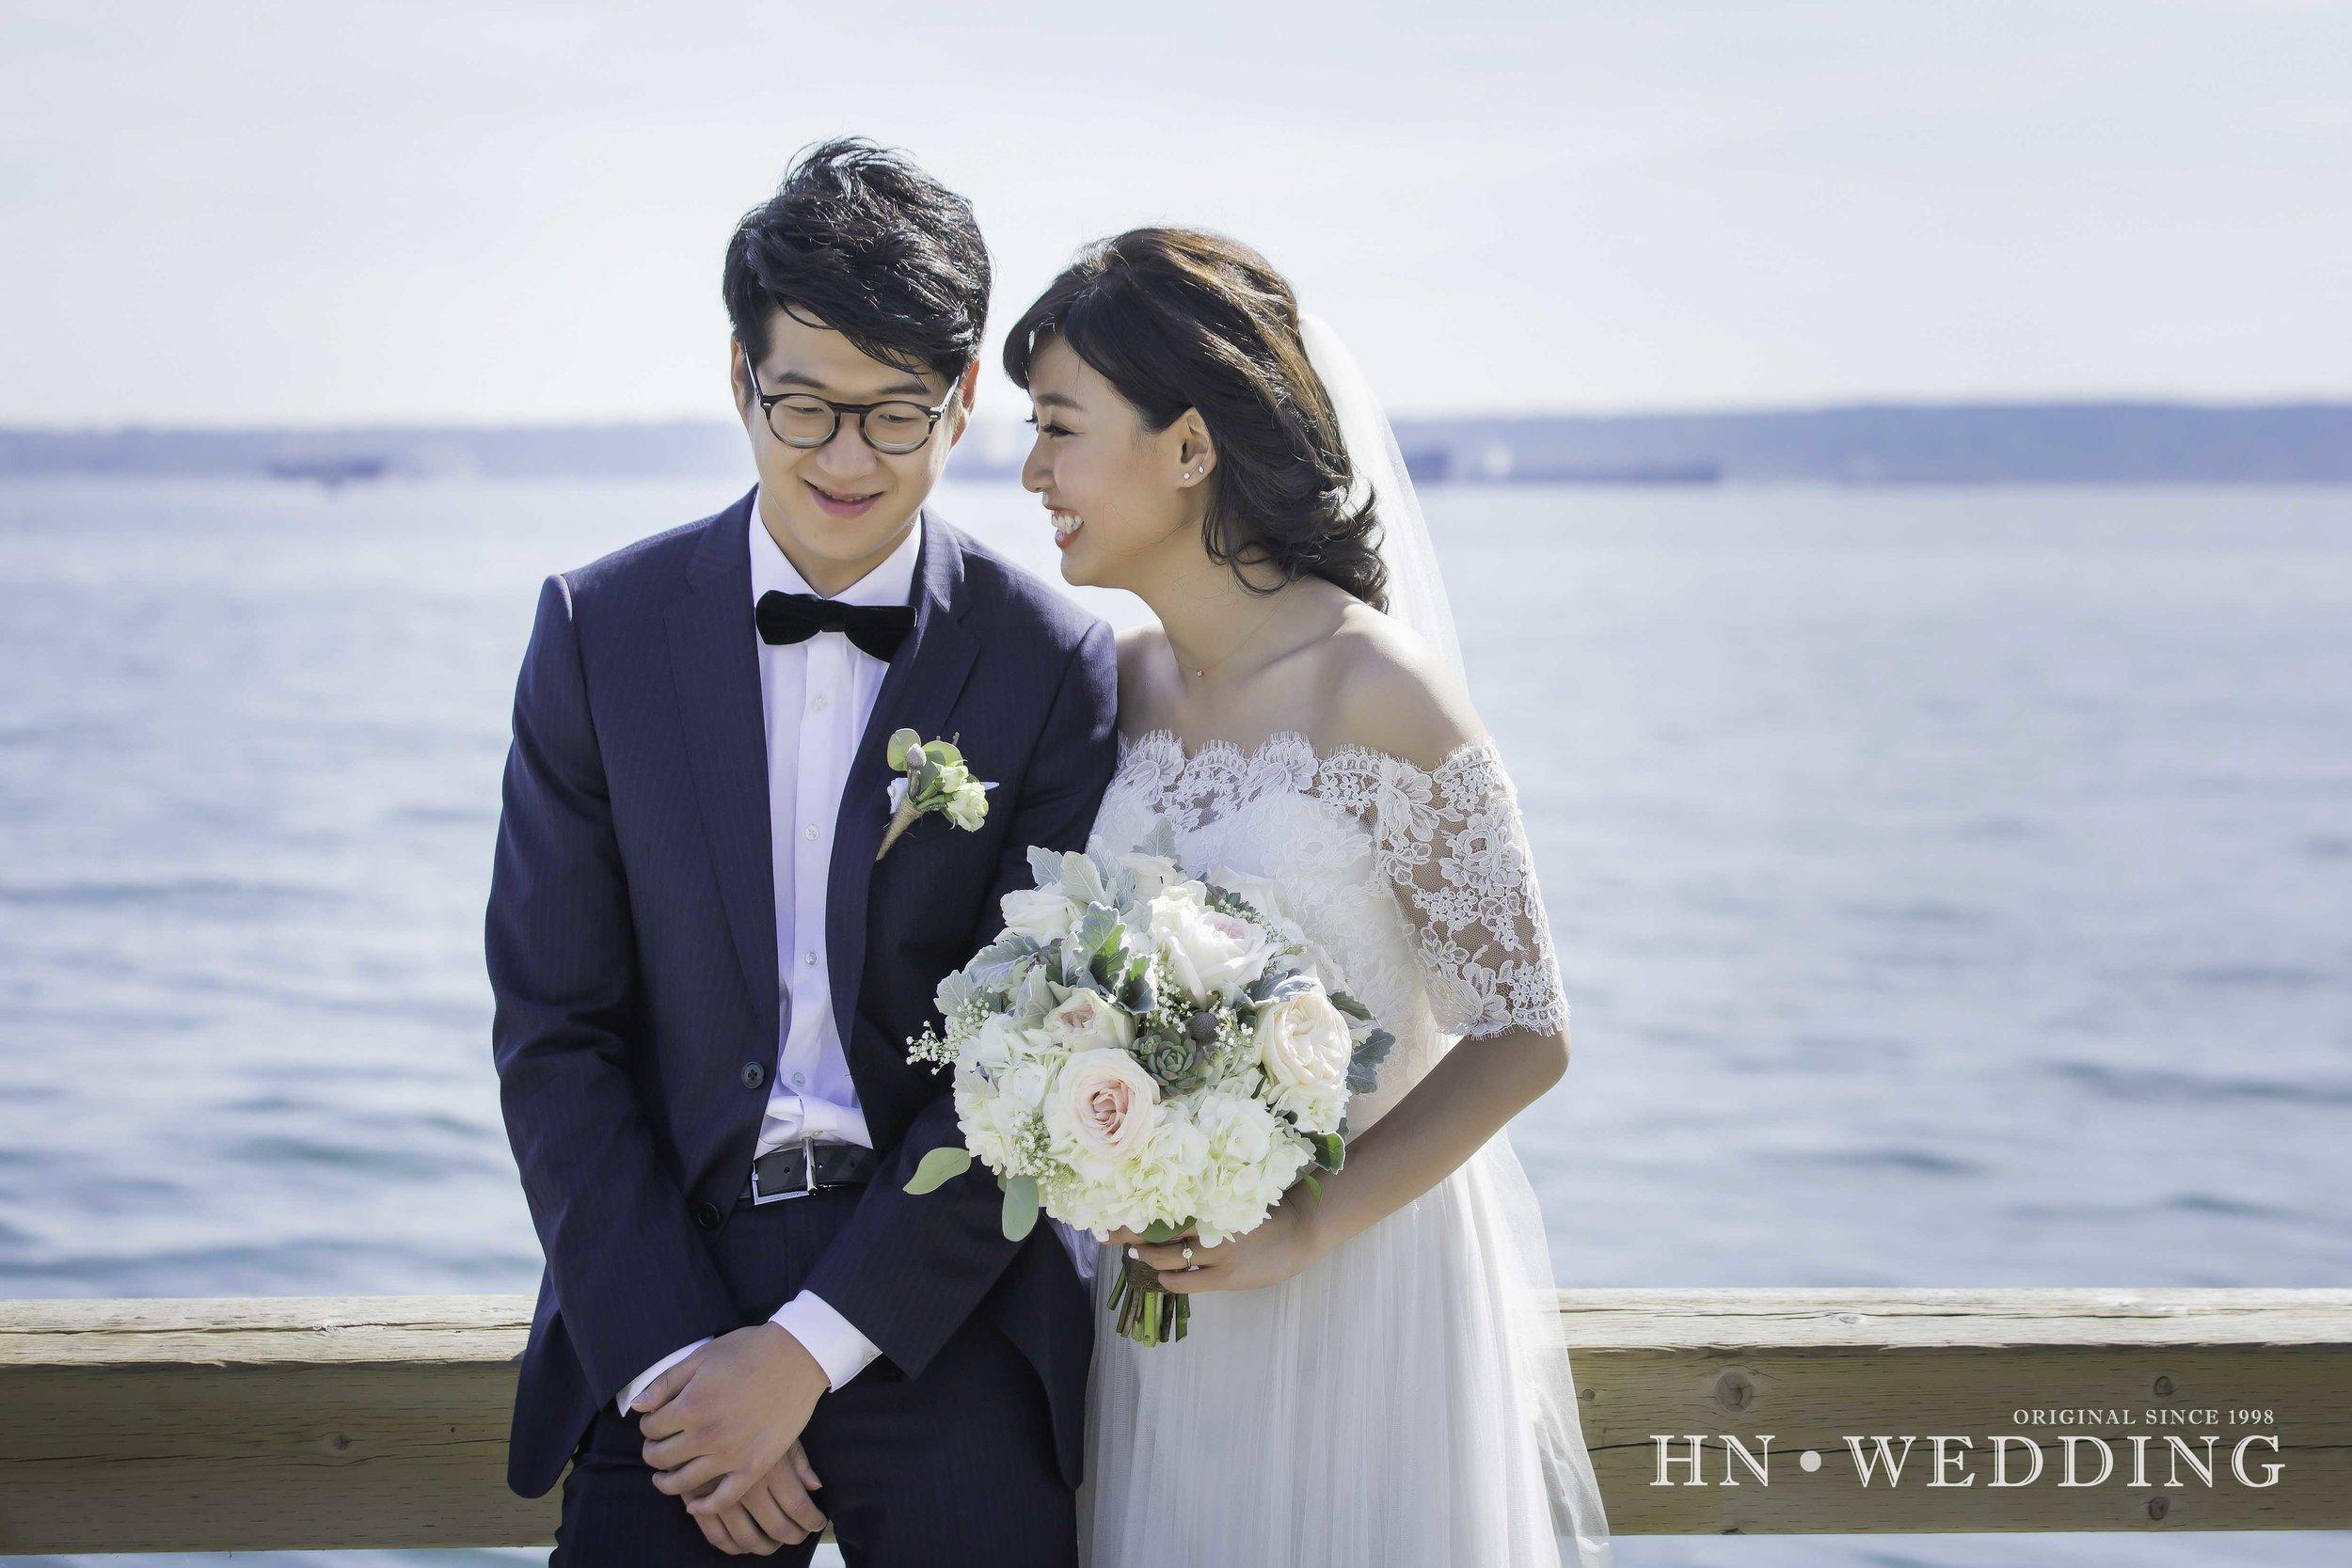 HNwedding-20160826-wedding-1594.jpg